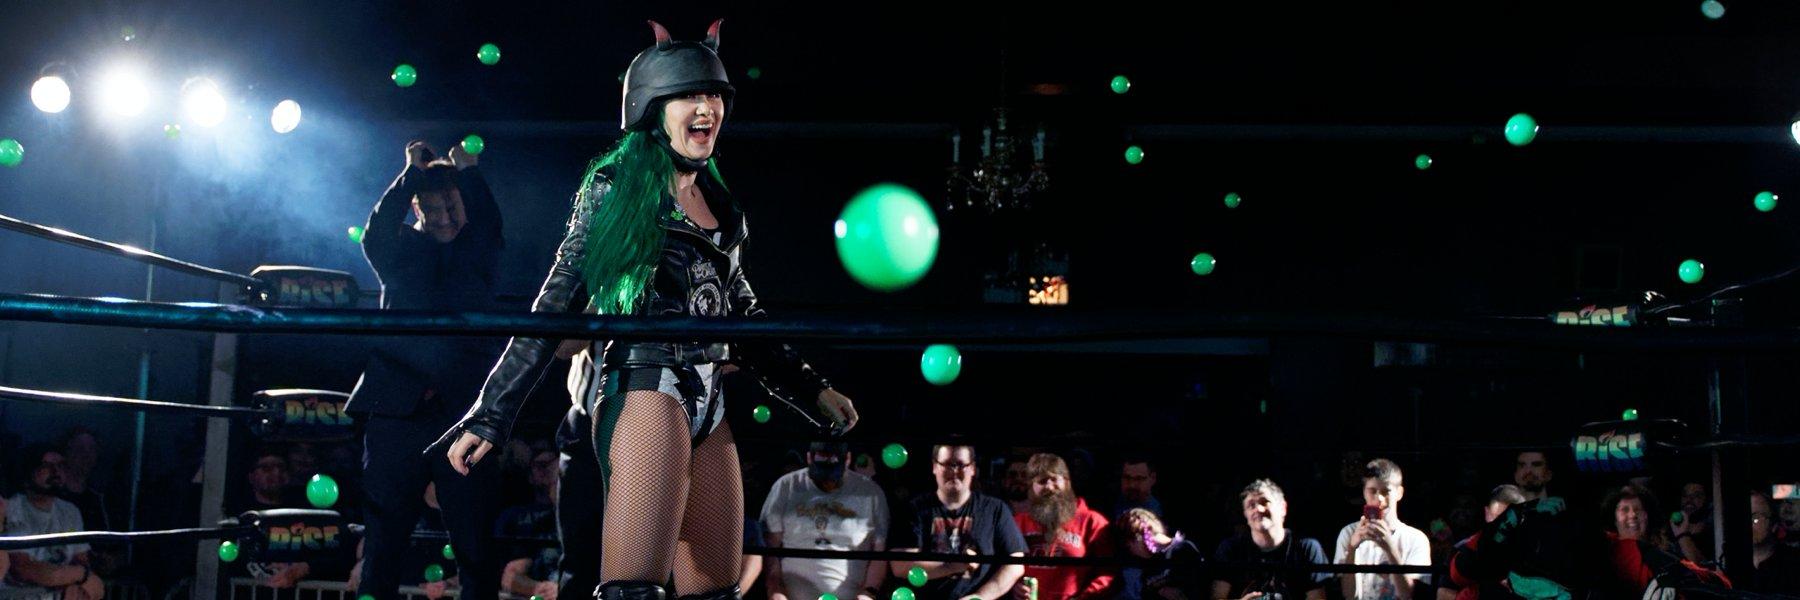 LA ESCALERA - Shotzi Blackheart's Farewell RISE Match!